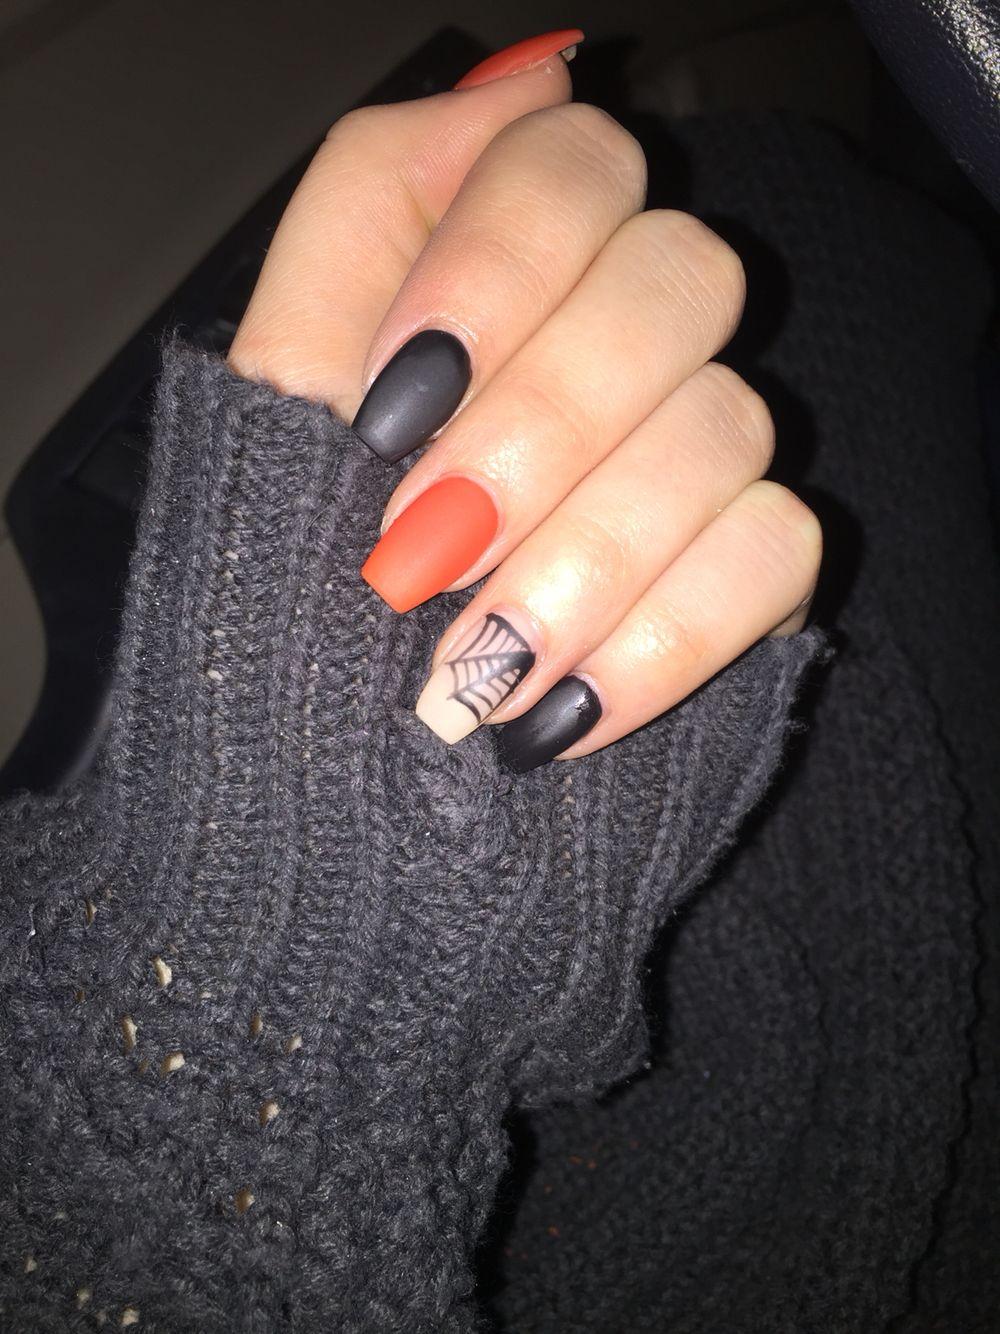 Halloween Nails Halloween Nails Fallnails Matte Acrylicnails Orange Black Nails Nail Time Beauty